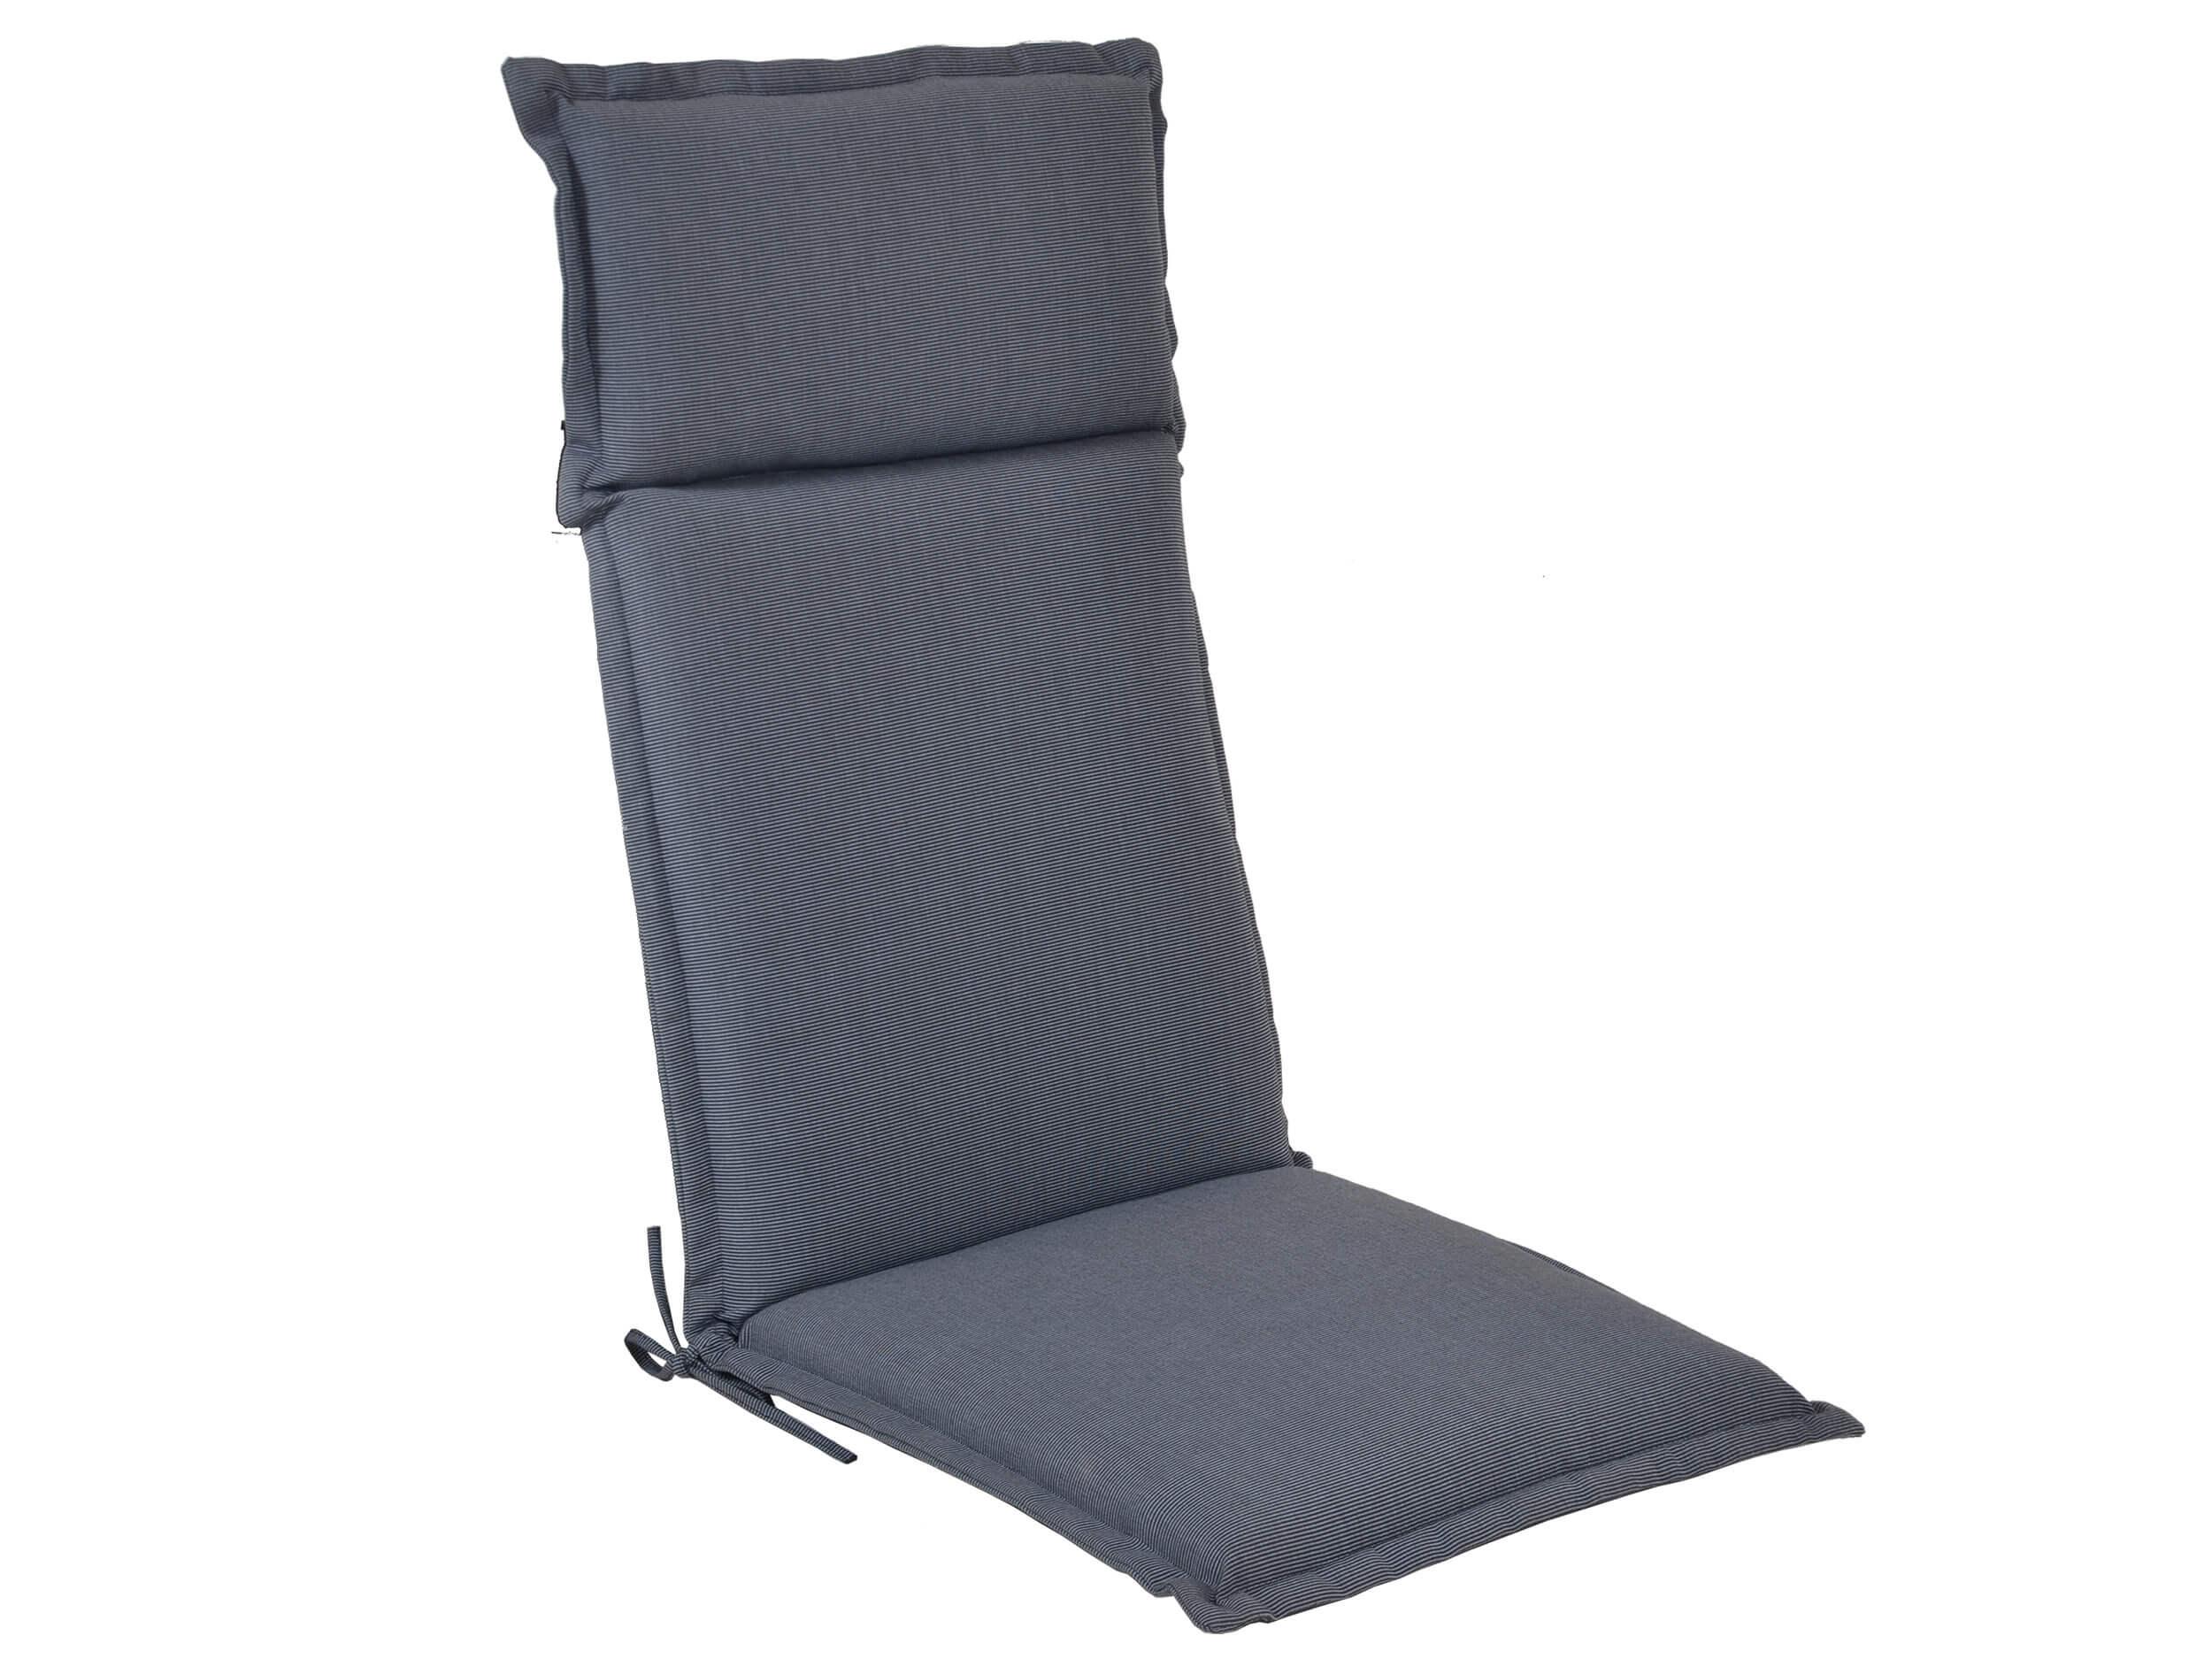 polsterauflage malibu f r hochlehner farbe grey gartenm bel l nse. Black Bedroom Furniture Sets. Home Design Ideas